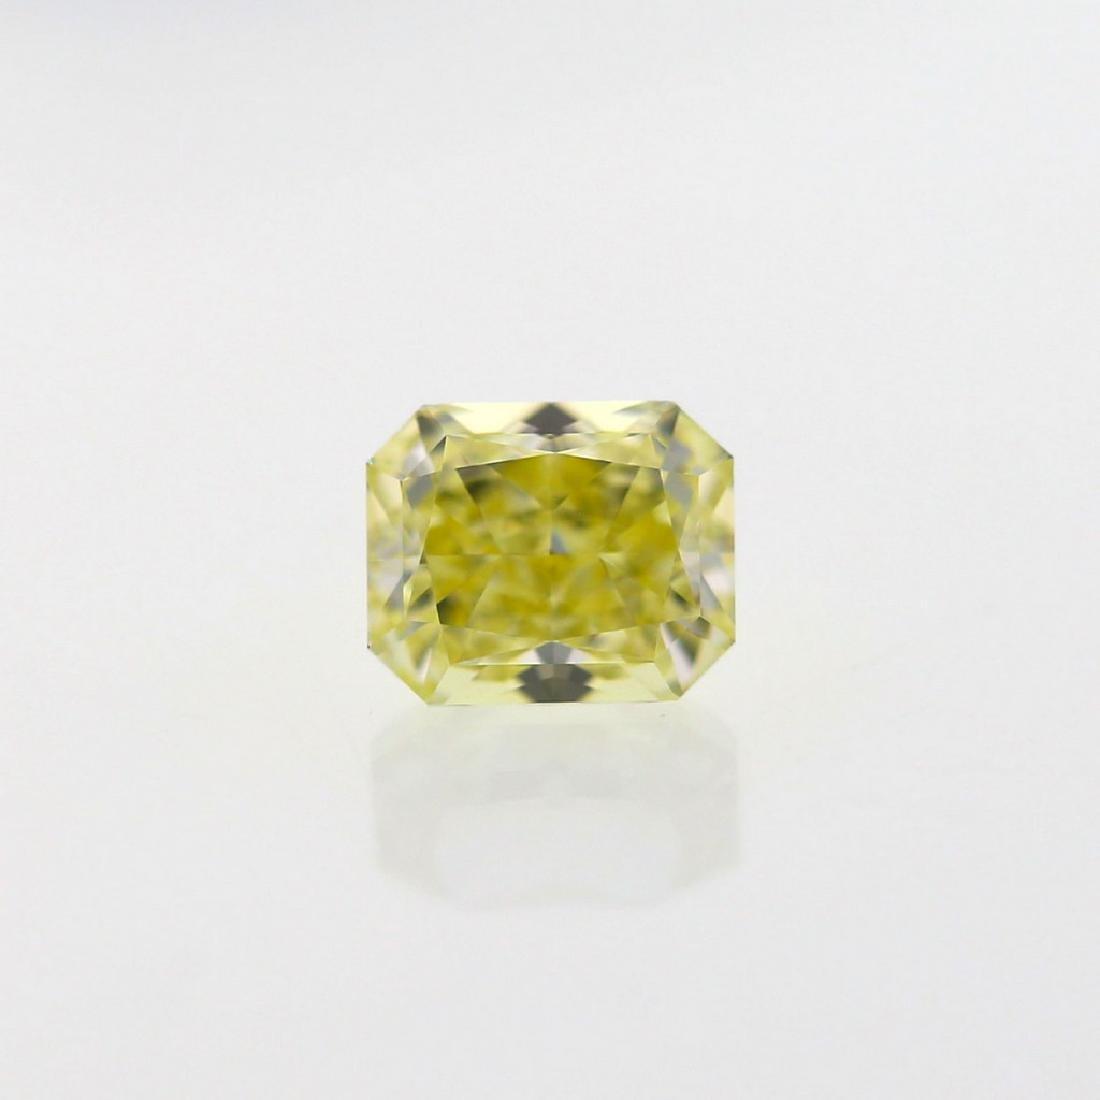 Natural Fancy Light Yellow 1.02 ct Cushion VVS1 - 7